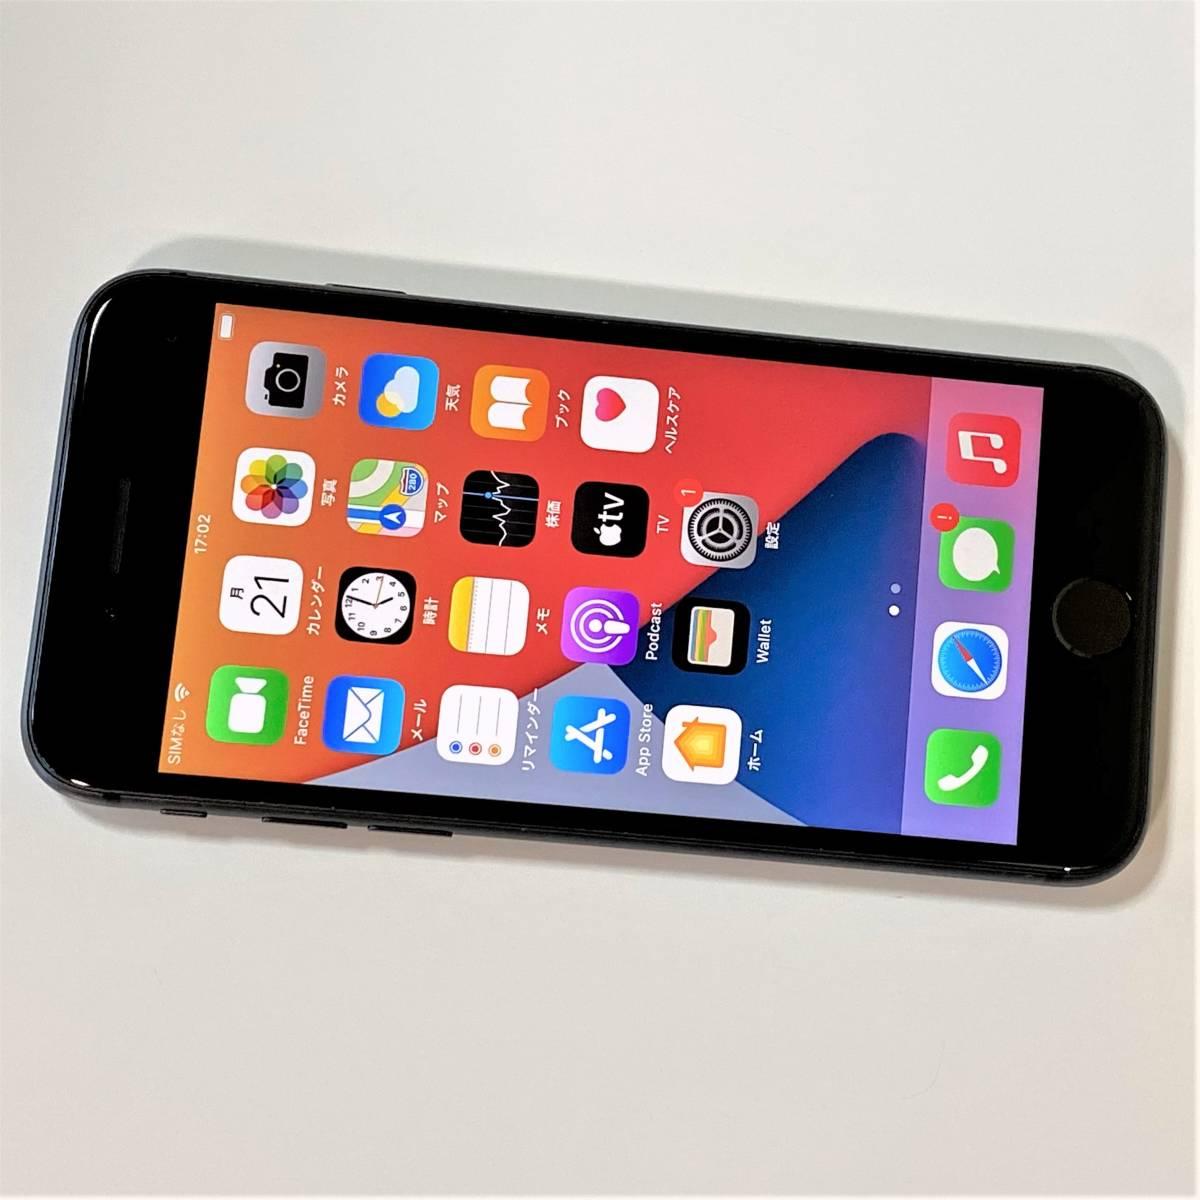 SIMフリー iPhone 8 スペースグレイ 256GB NQ842J/A バッテリー最大容量99% docomo 格安SIM MVNO 海外可 アクティベーションロック解除済